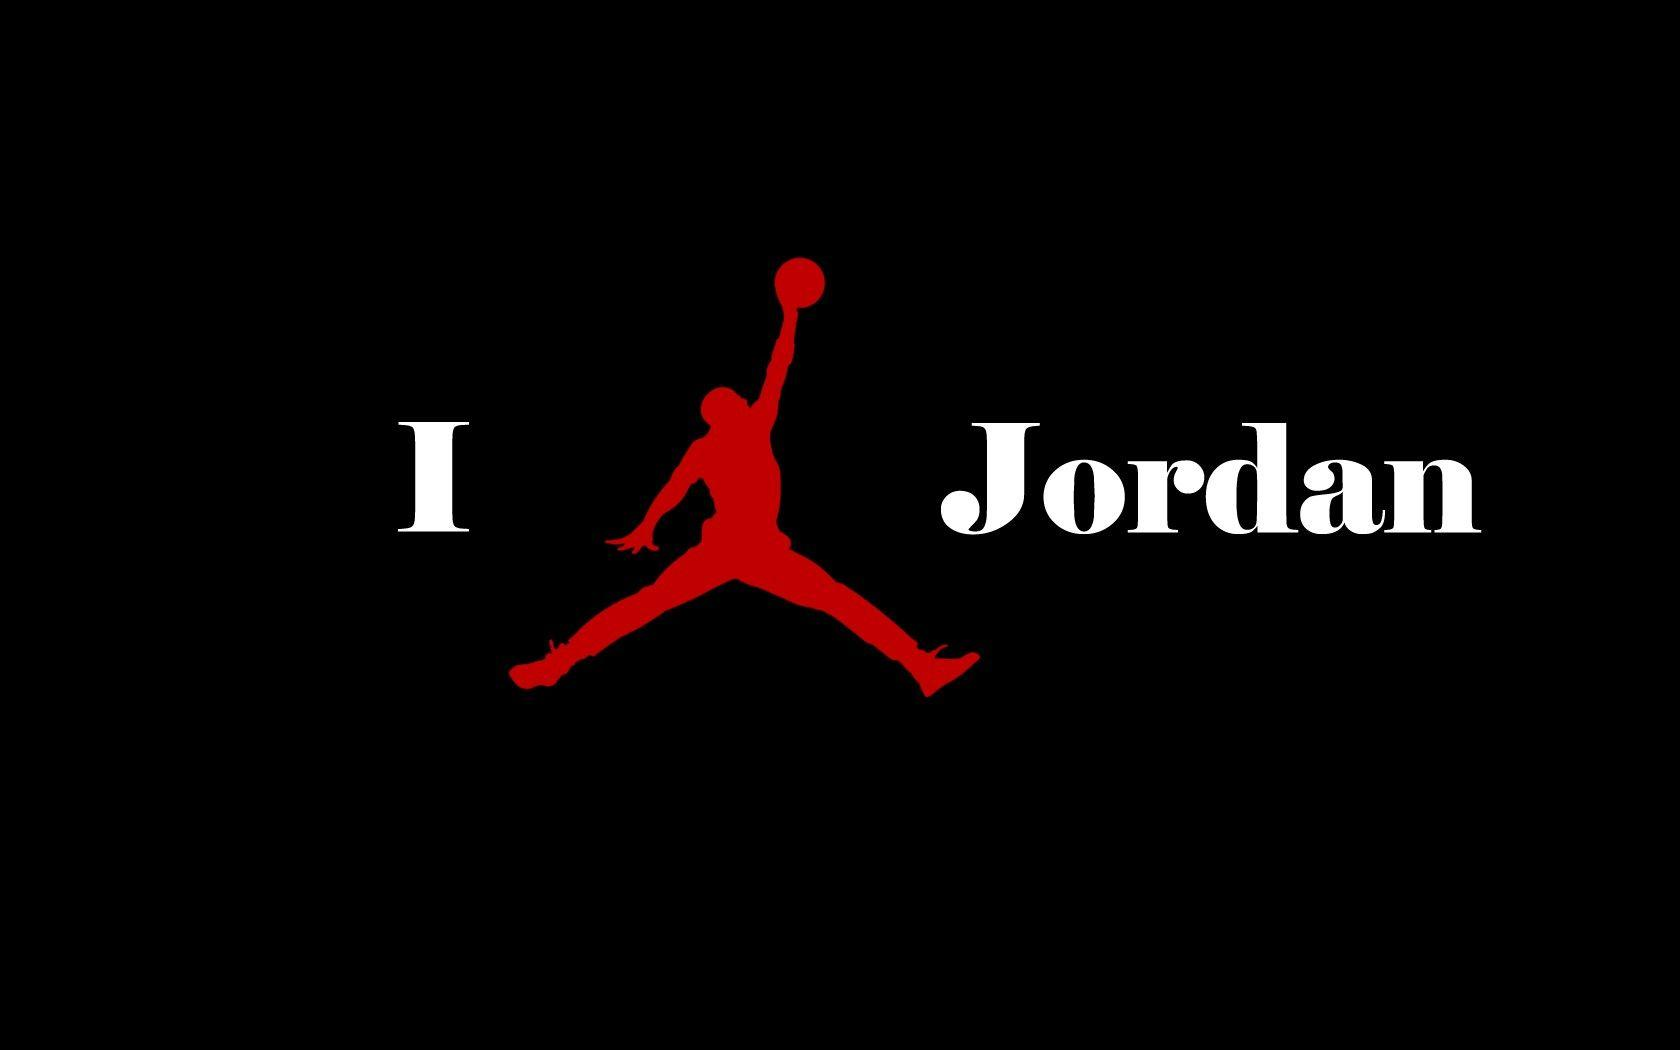 Michael jordan logo free transparent png logos - Jordan jumpman logo wallpaper ...